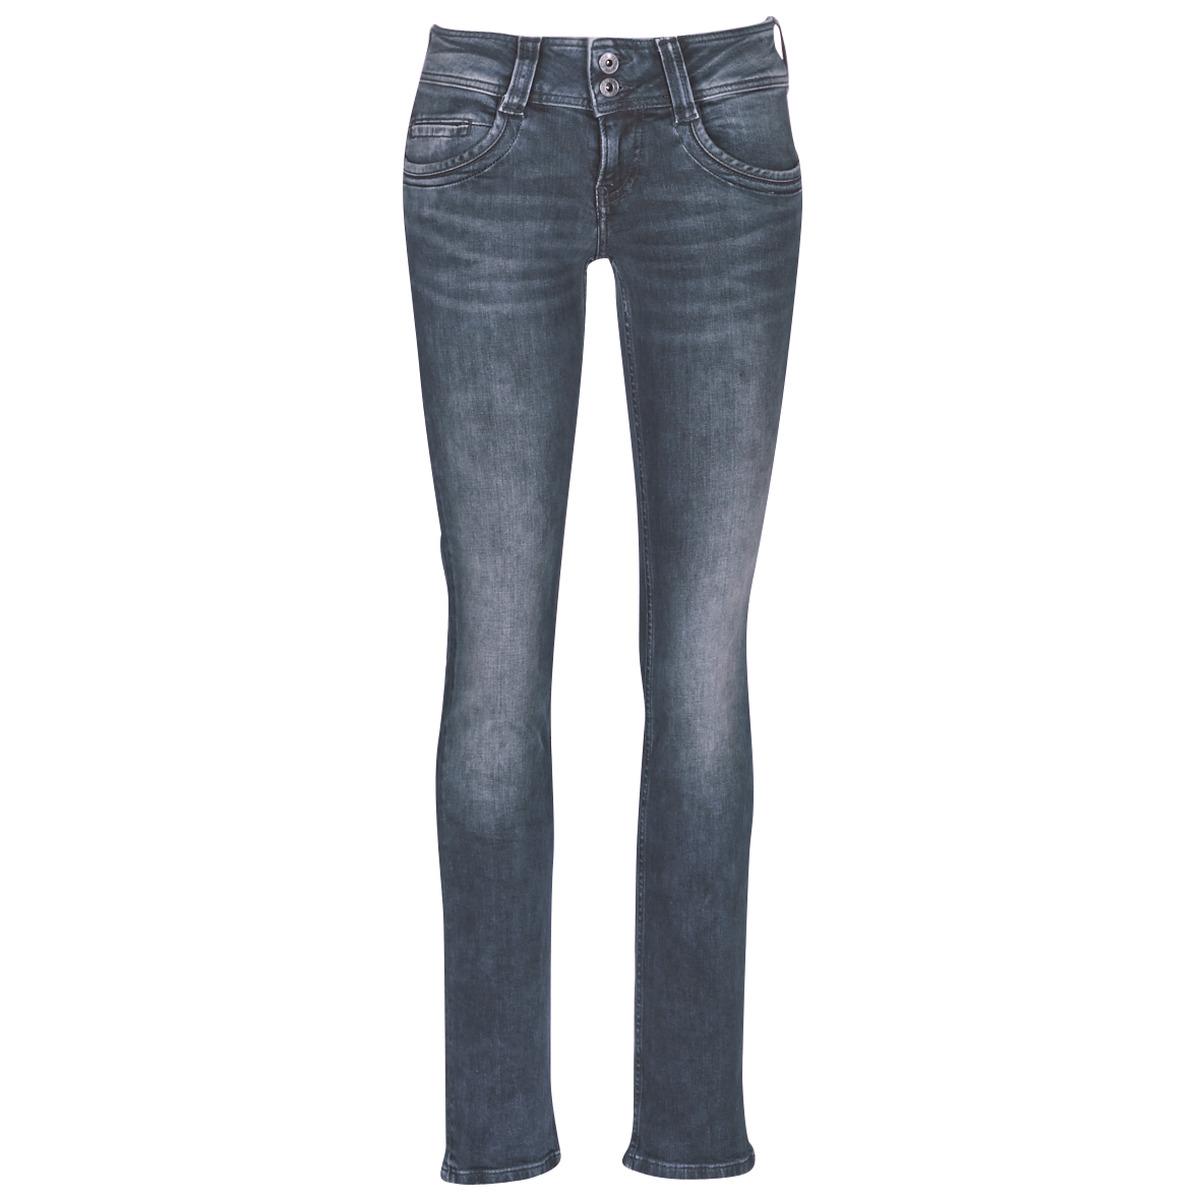 Pepe Gen Gen Pepe Jeans Pepe Pepe Jeans Jeans Jeans Gen Gen JTKclF1